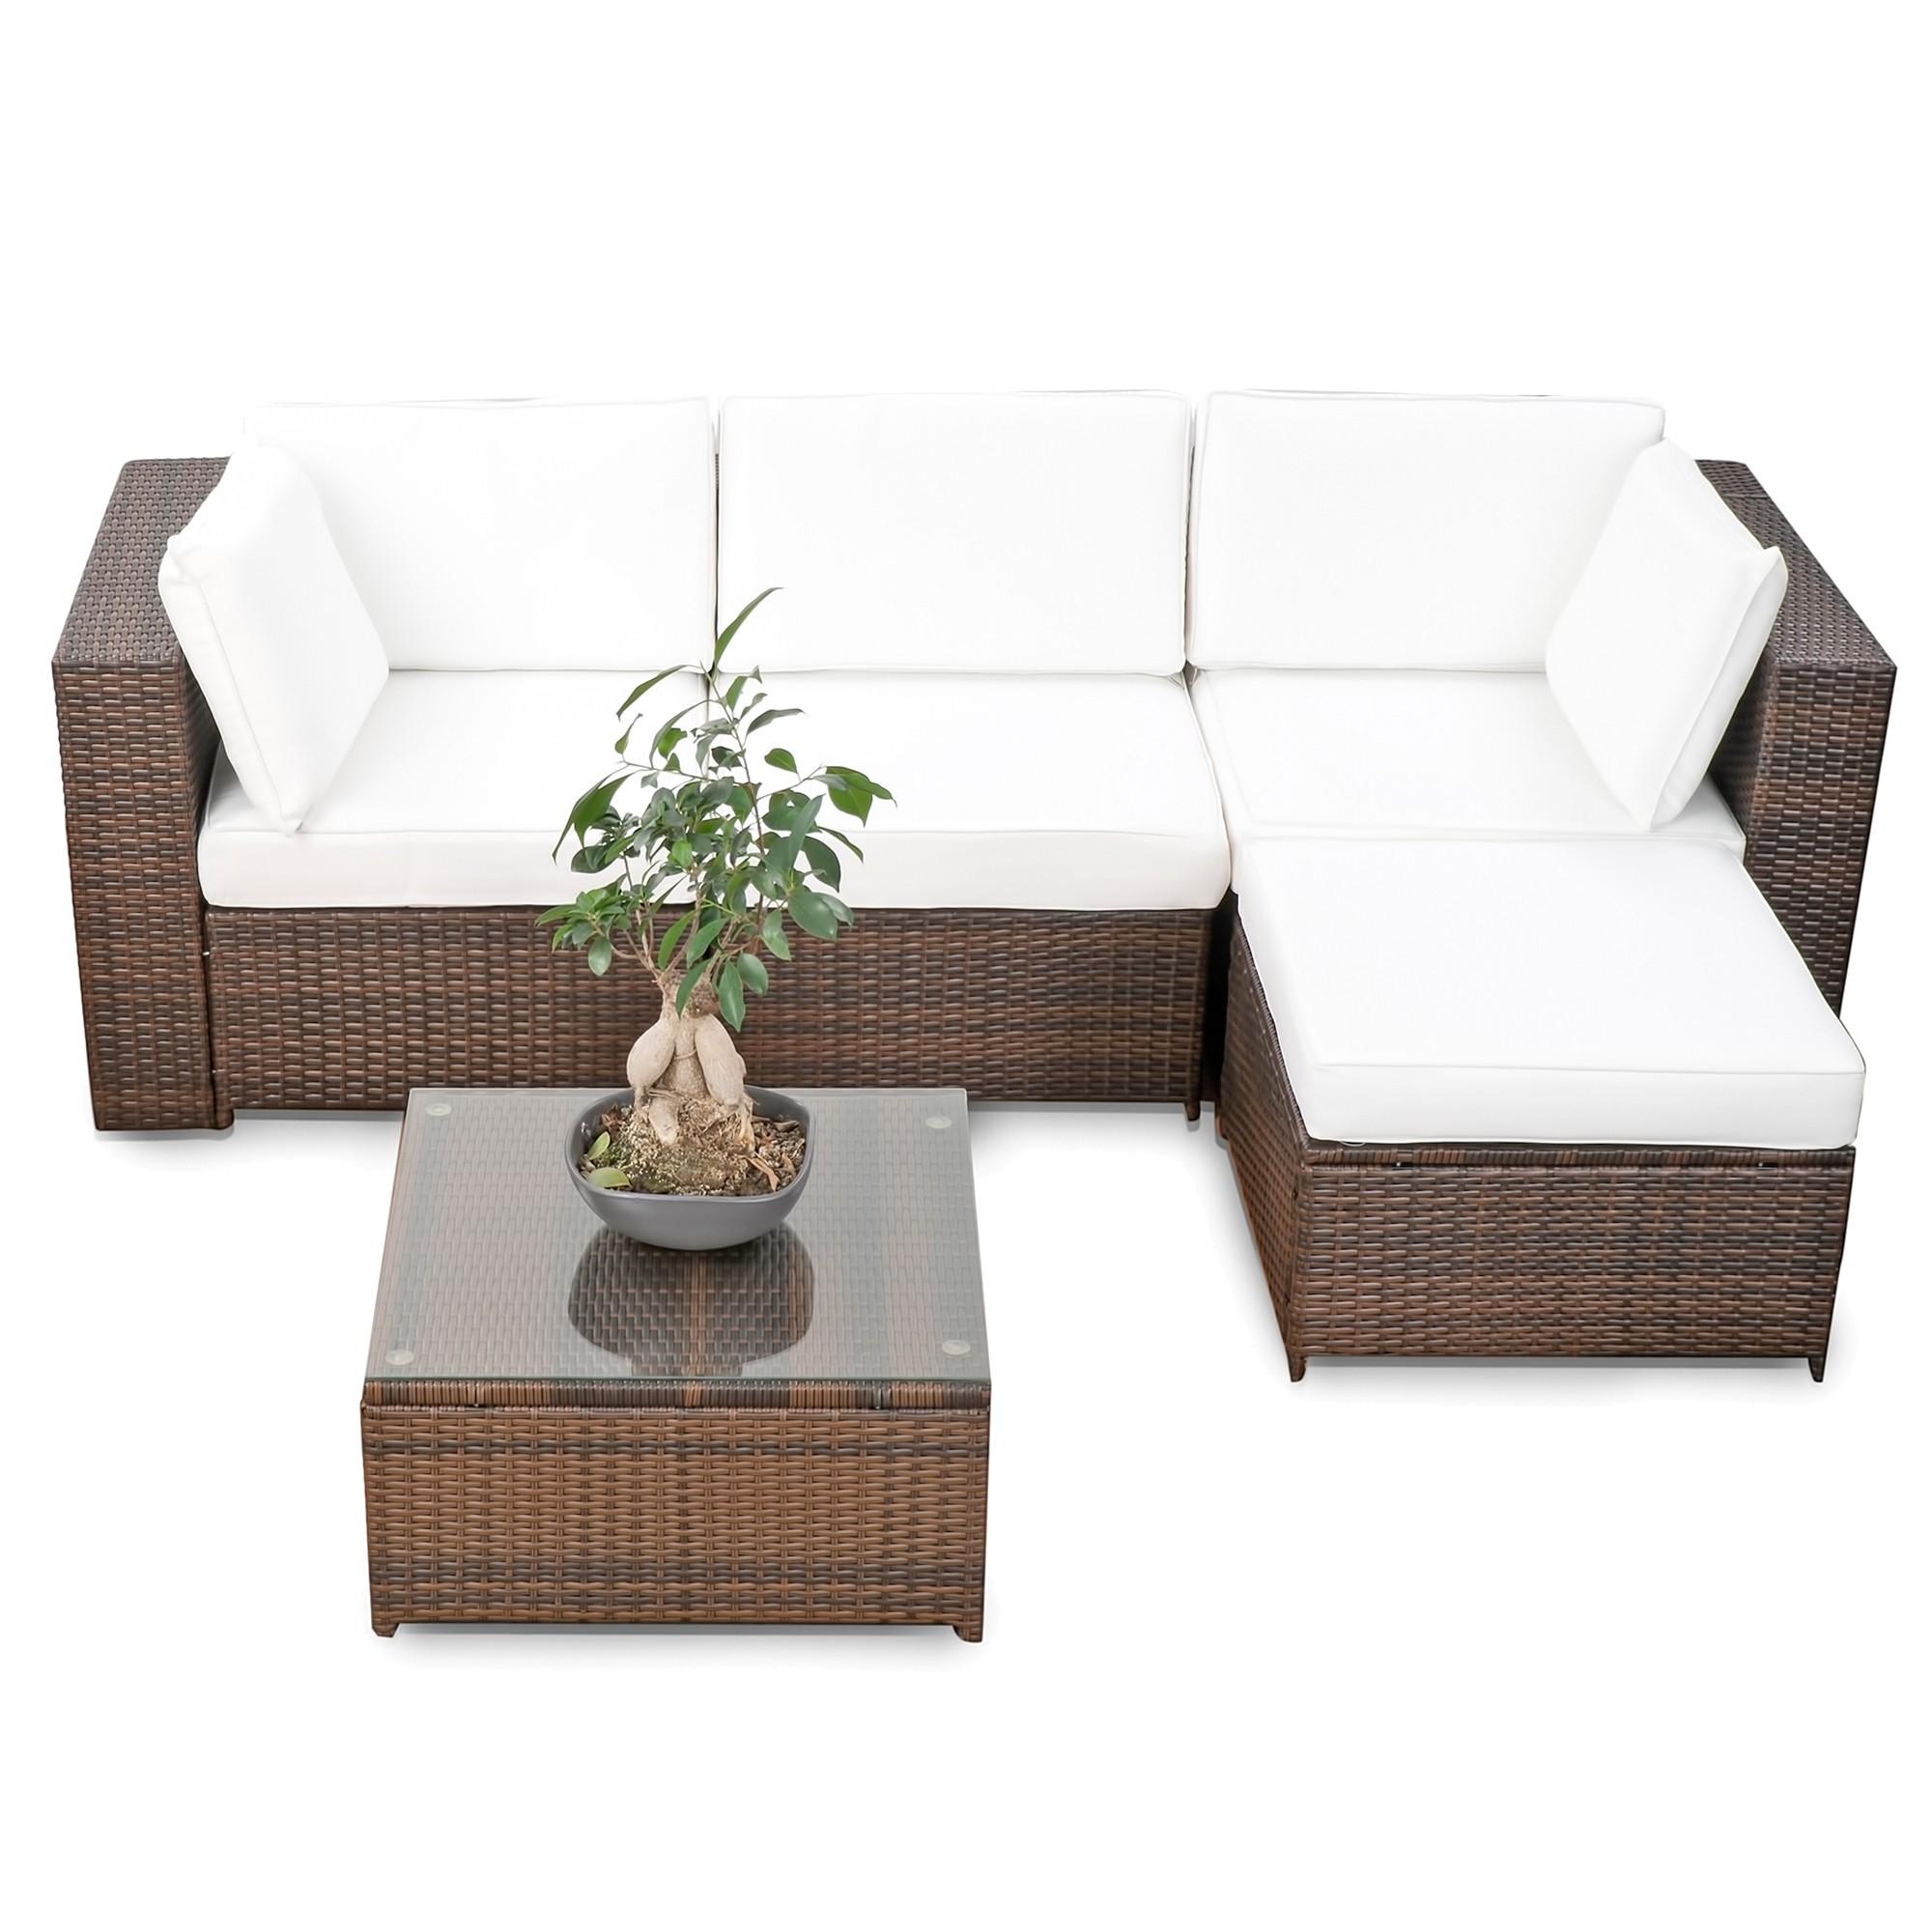 balkon lounge set destiny collection loft balkon lounge. Black Bedroom Furniture Sets. Home Design Ideas